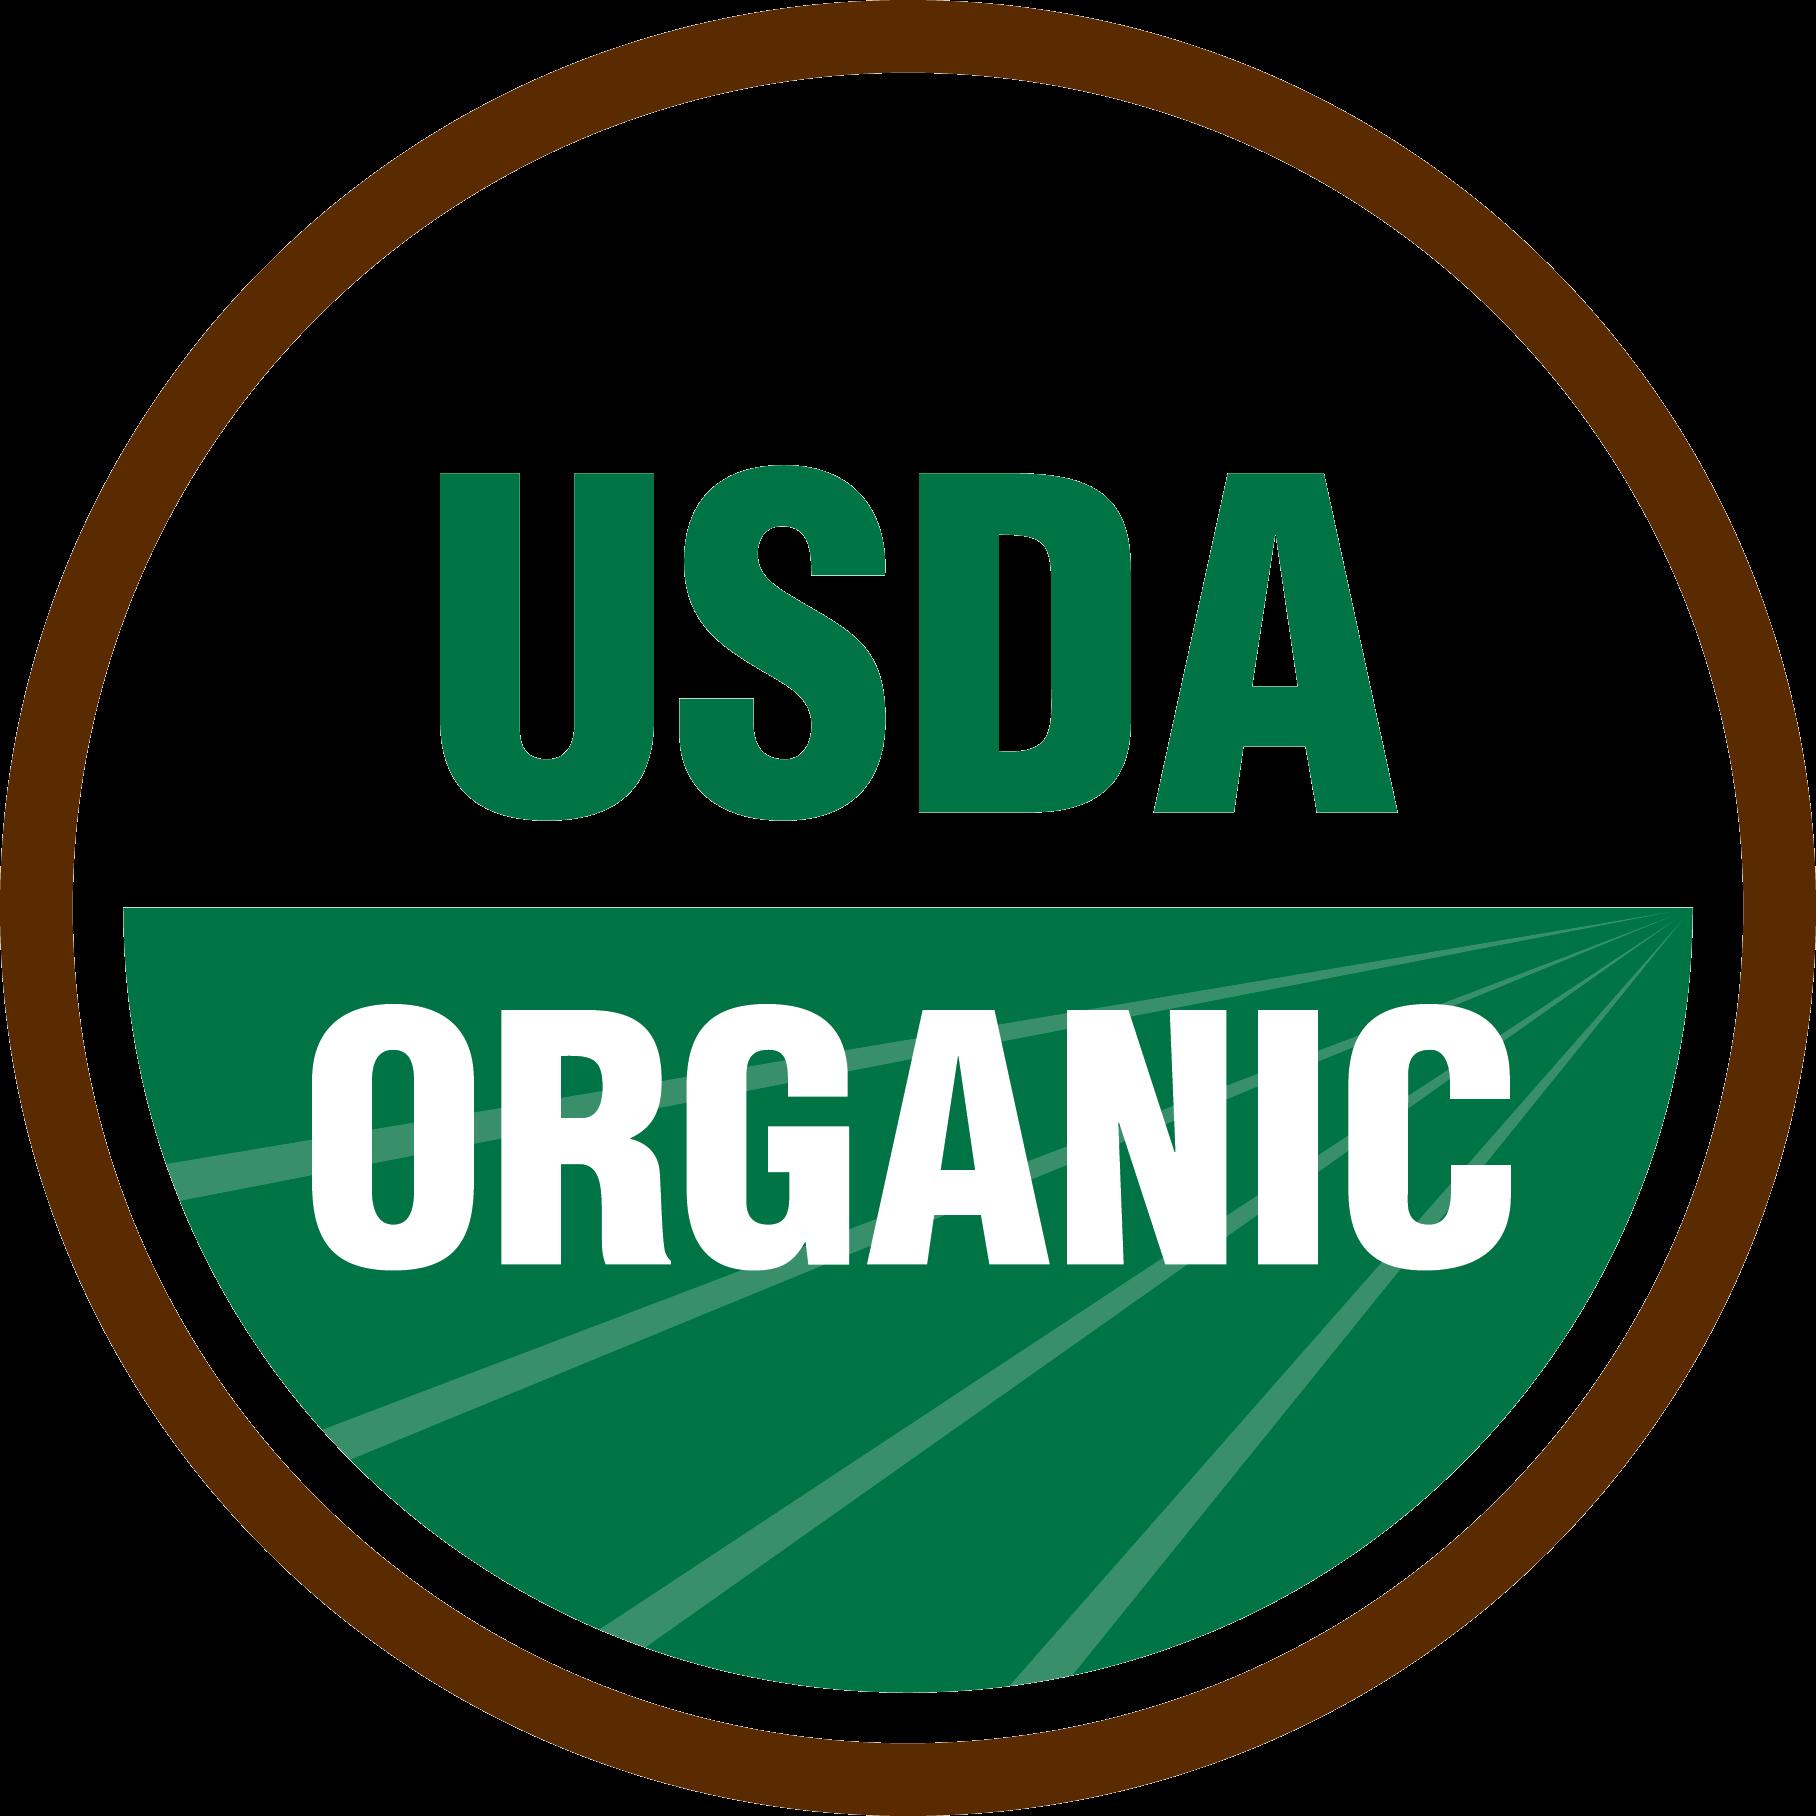 USDA Organic  Certification logo image